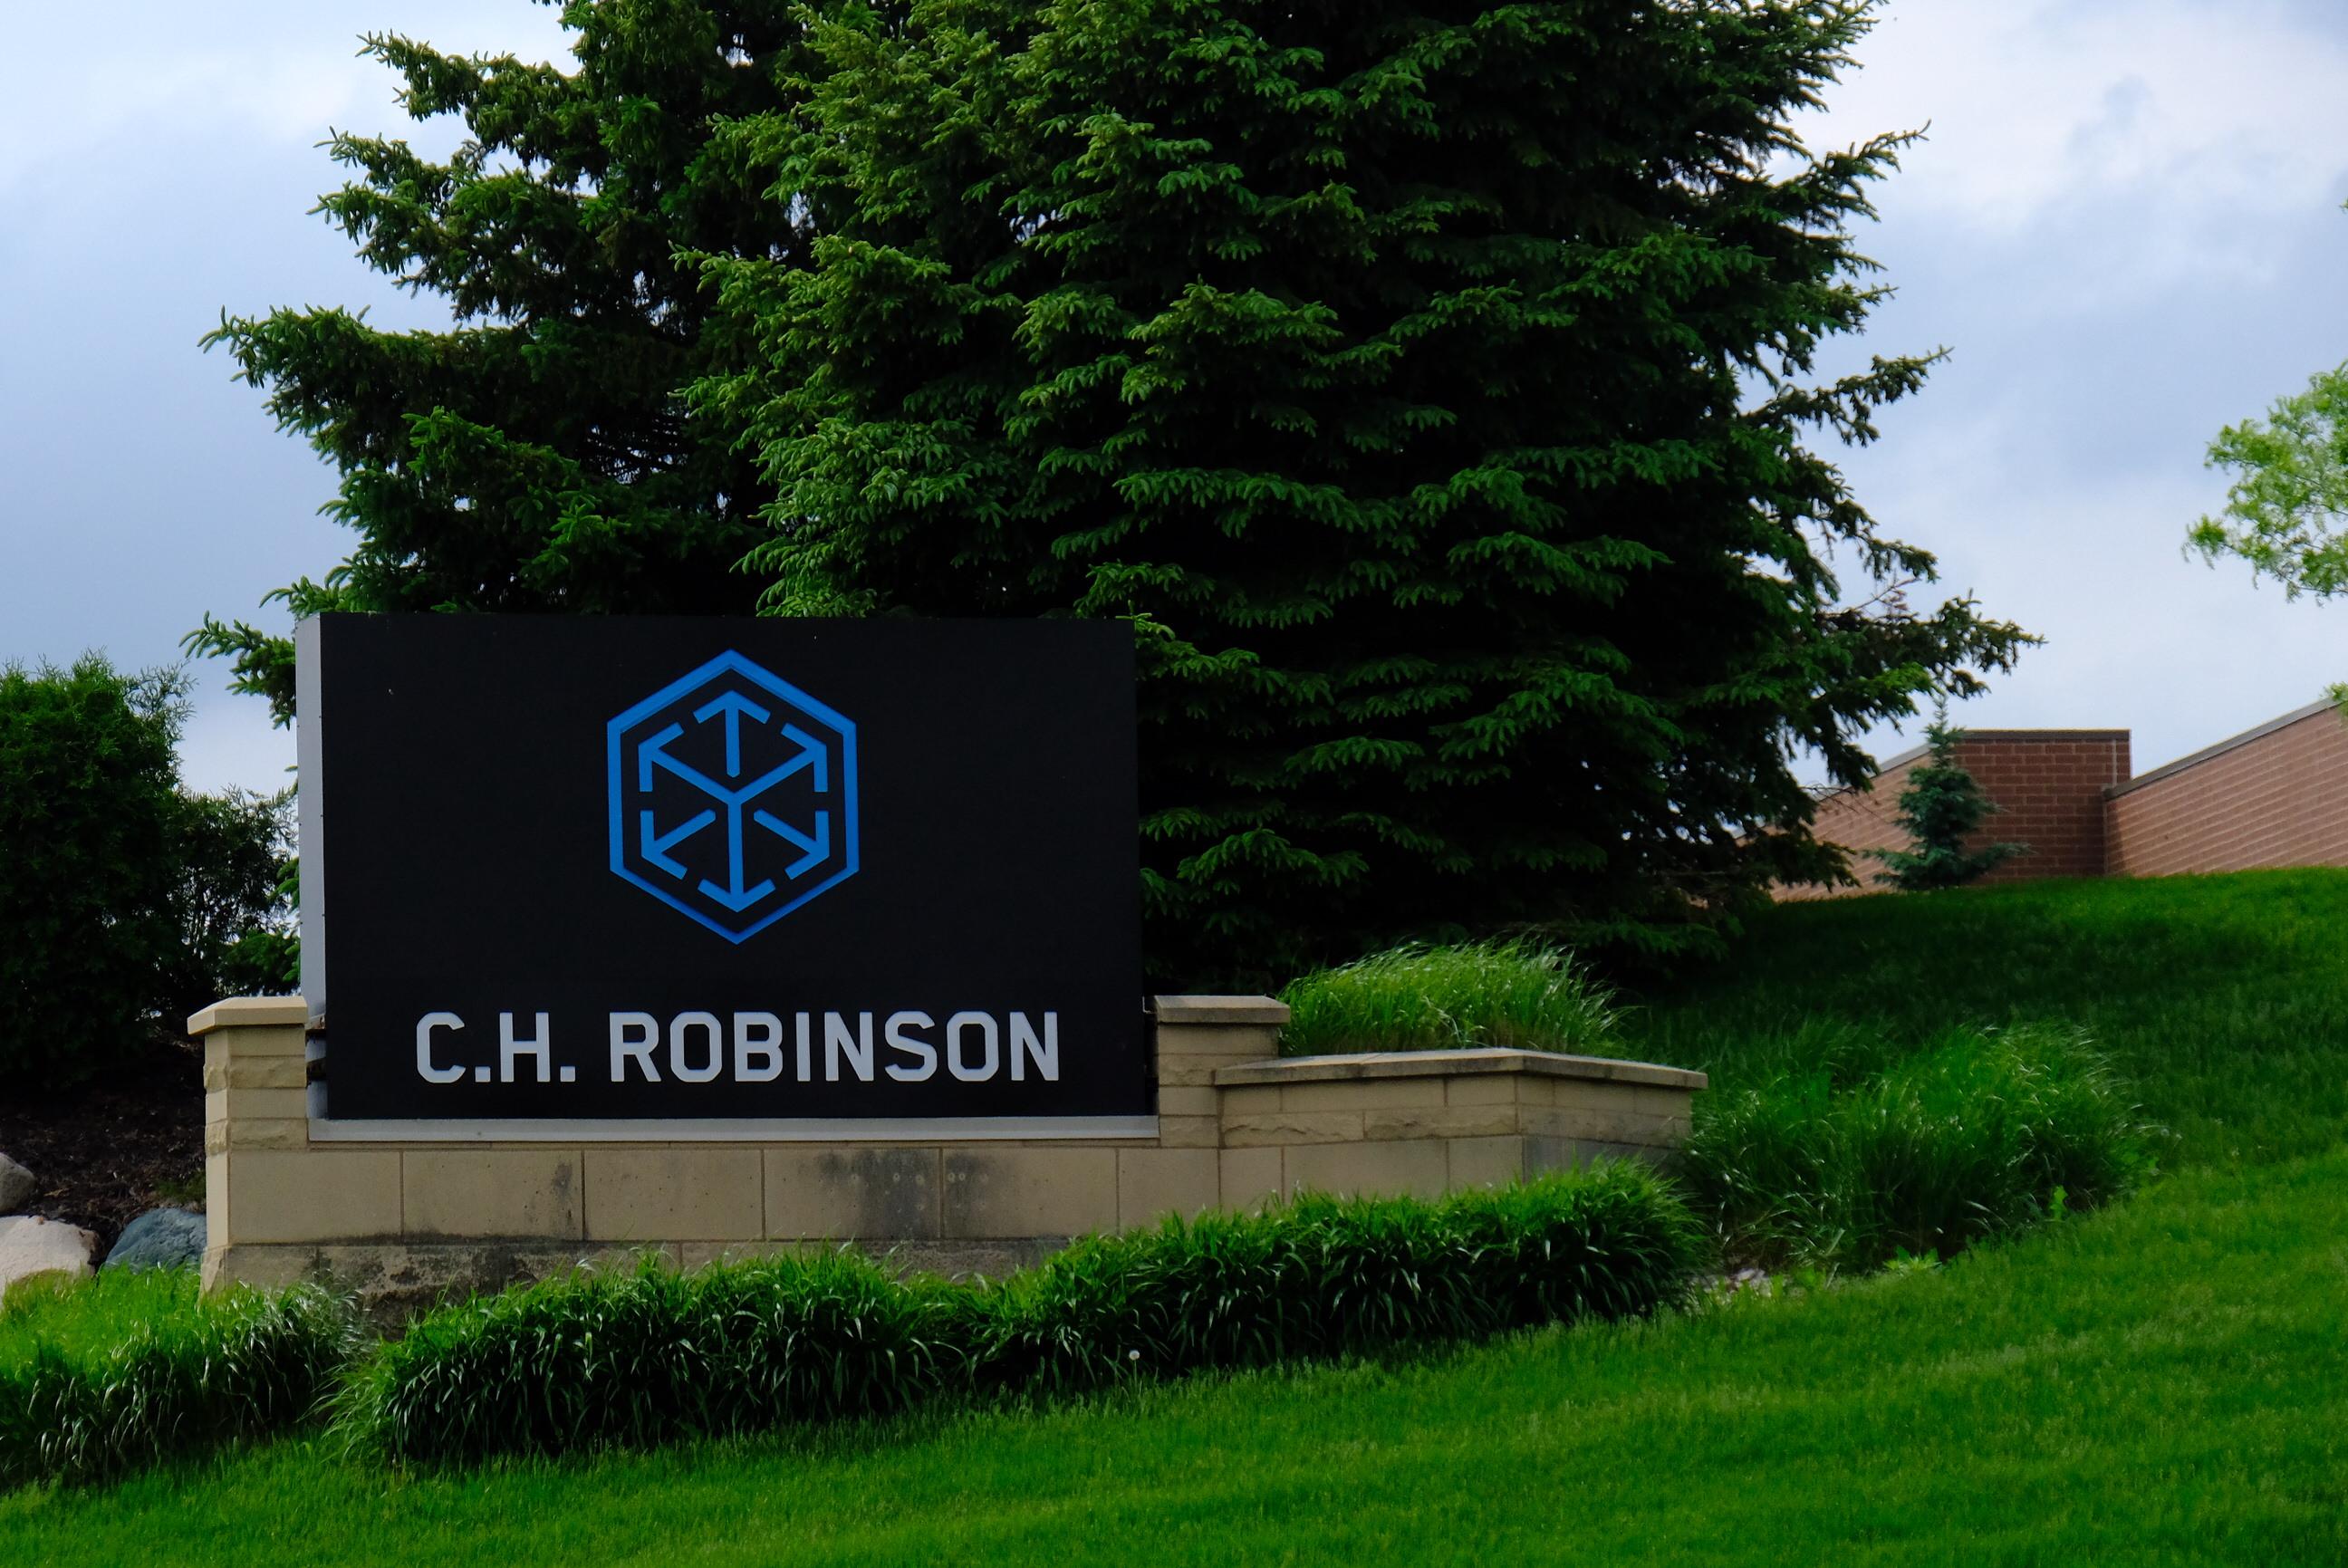 Entrance to C.H. Robinson's corporate headquarters in Eden Prairie, Minnesota.